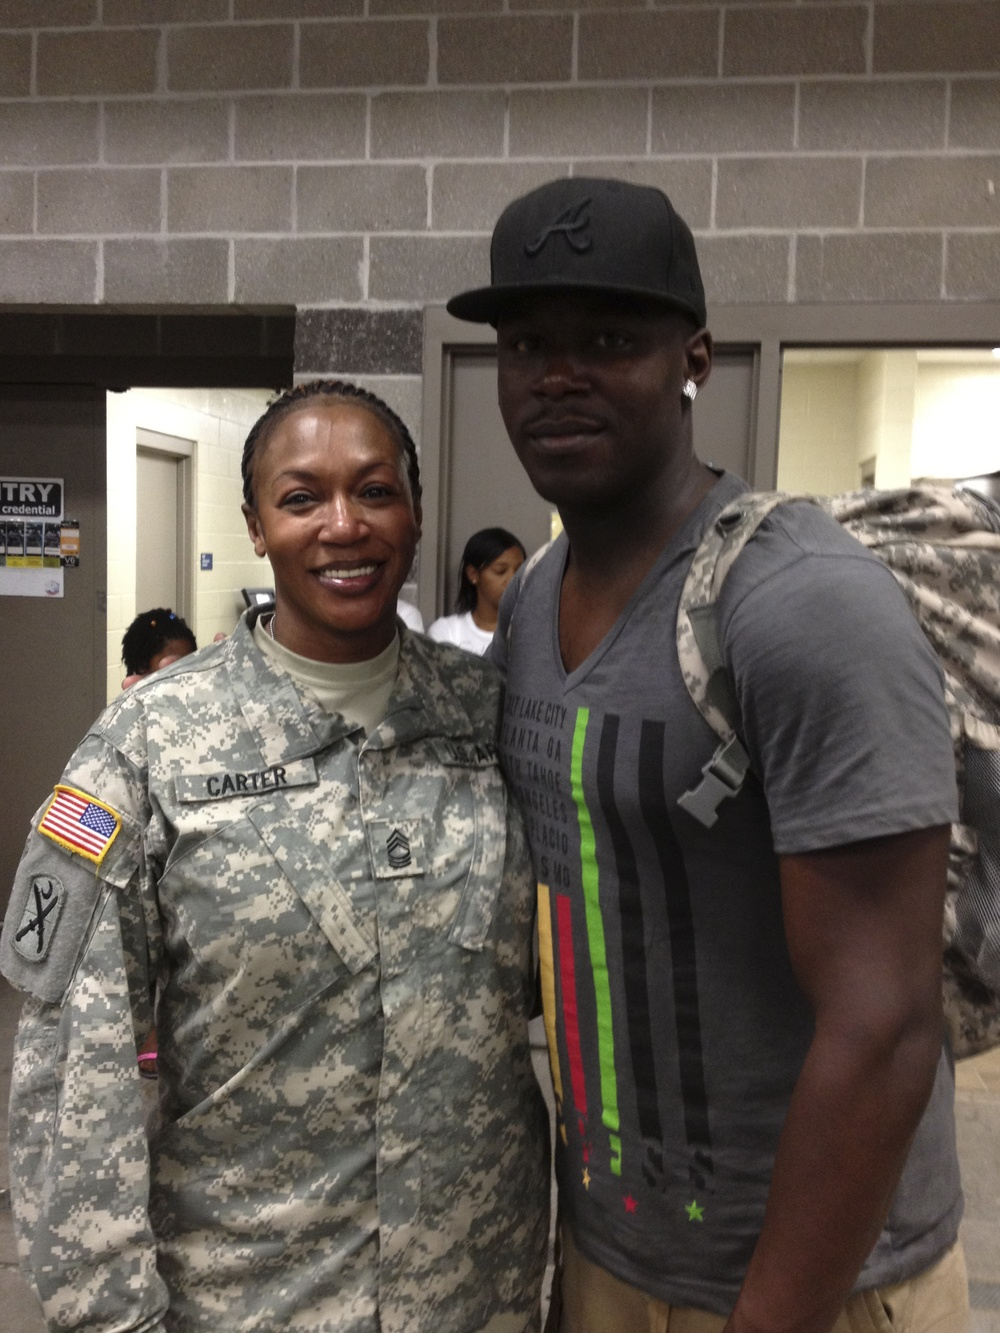 The South Carolina National Guard: A Family that serves